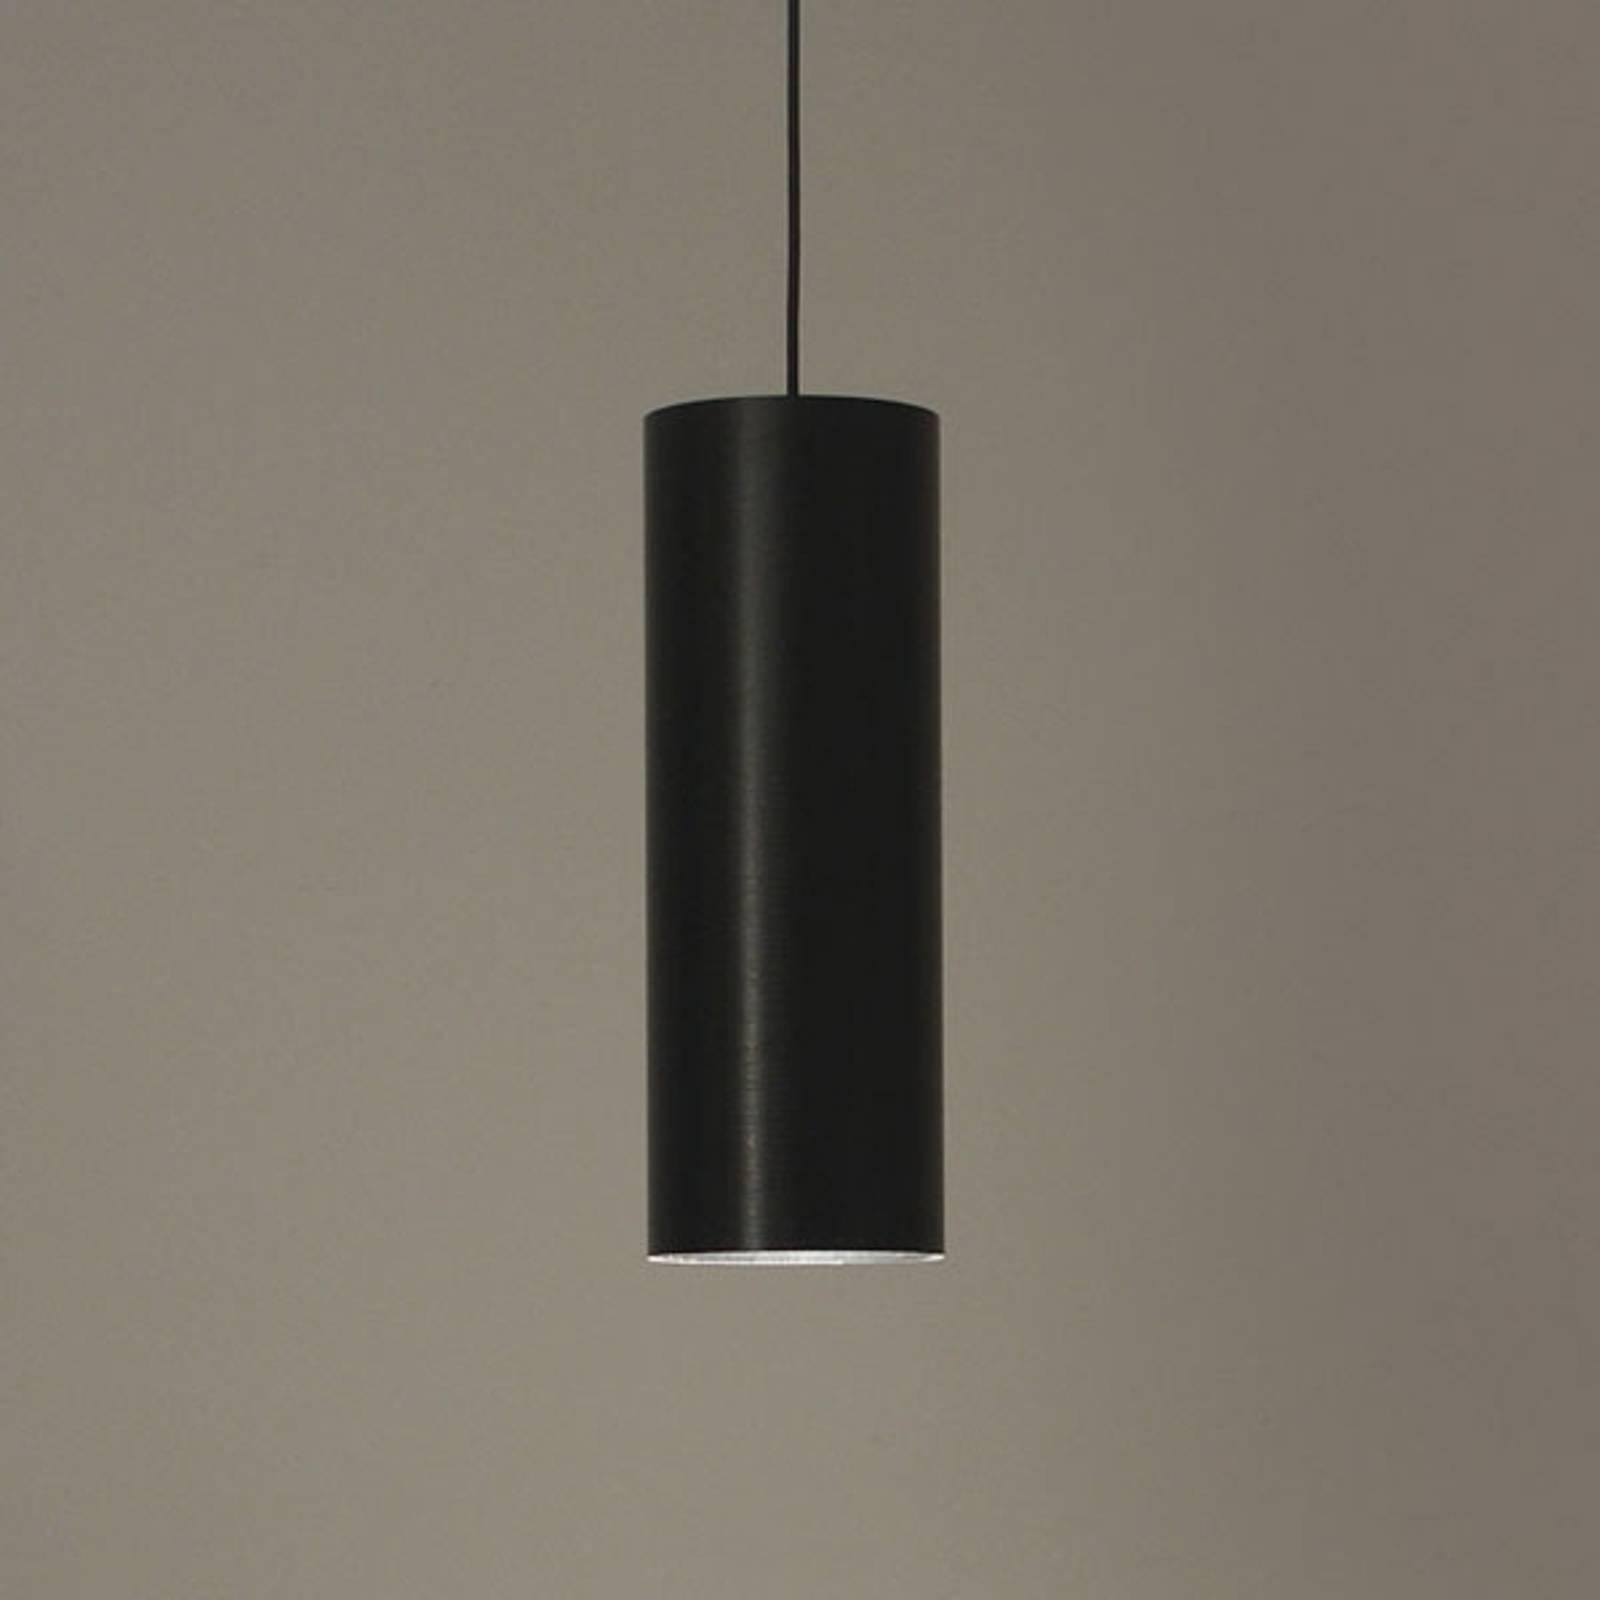 Designerska lampa wisząca Tube 40